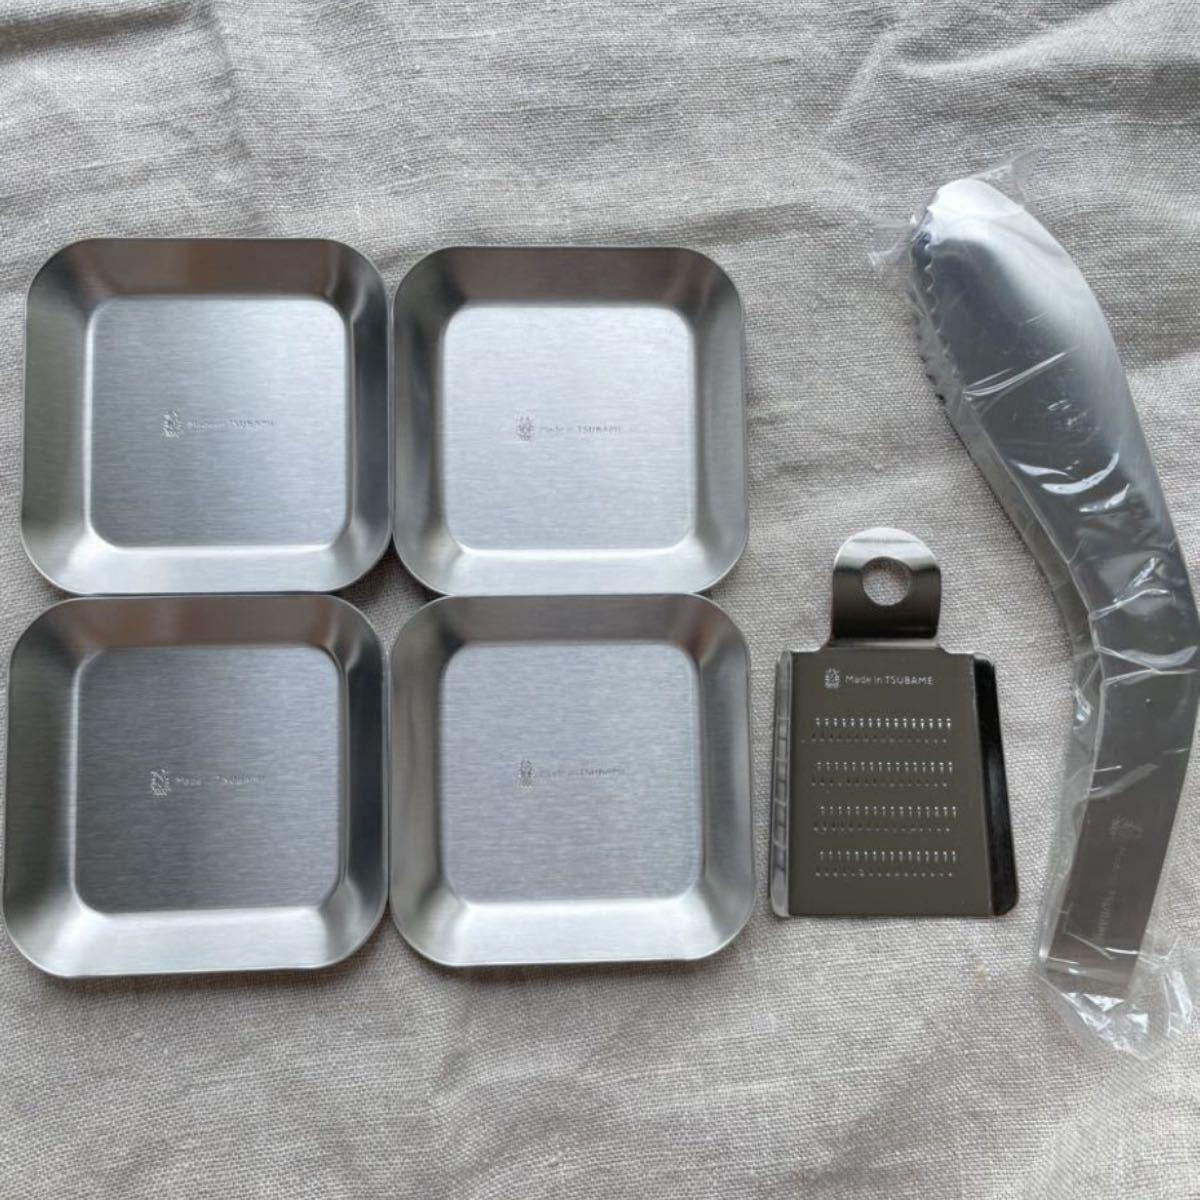 TSUBAME おろし金 トング 薬味小皿 ステンレス 6点 燕三条 日本製